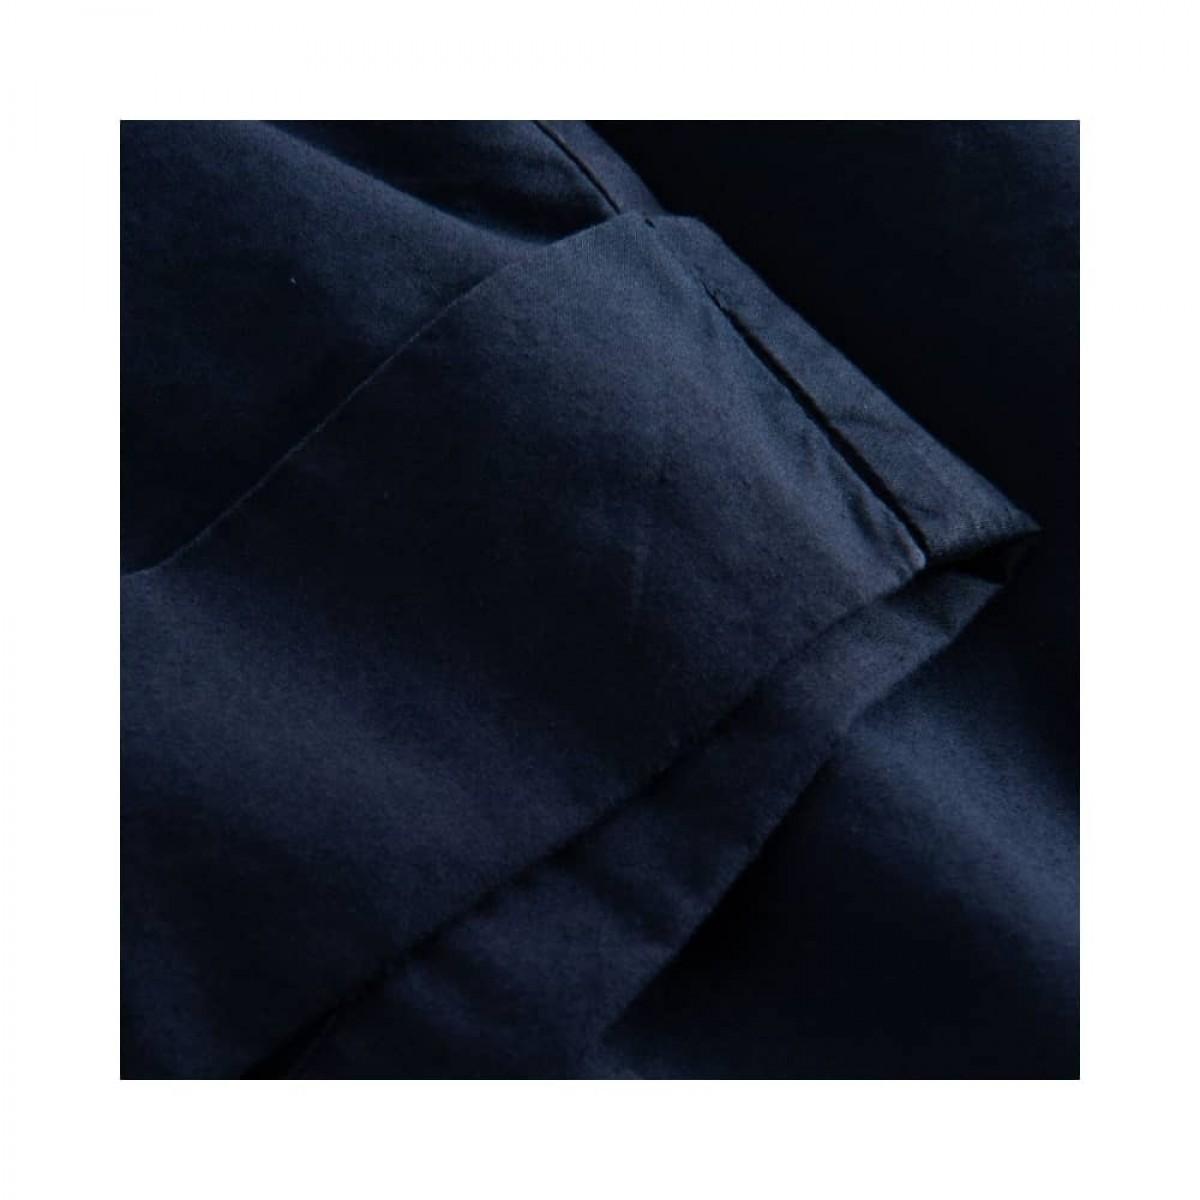 peony shorts - dark navy - opslag i ben